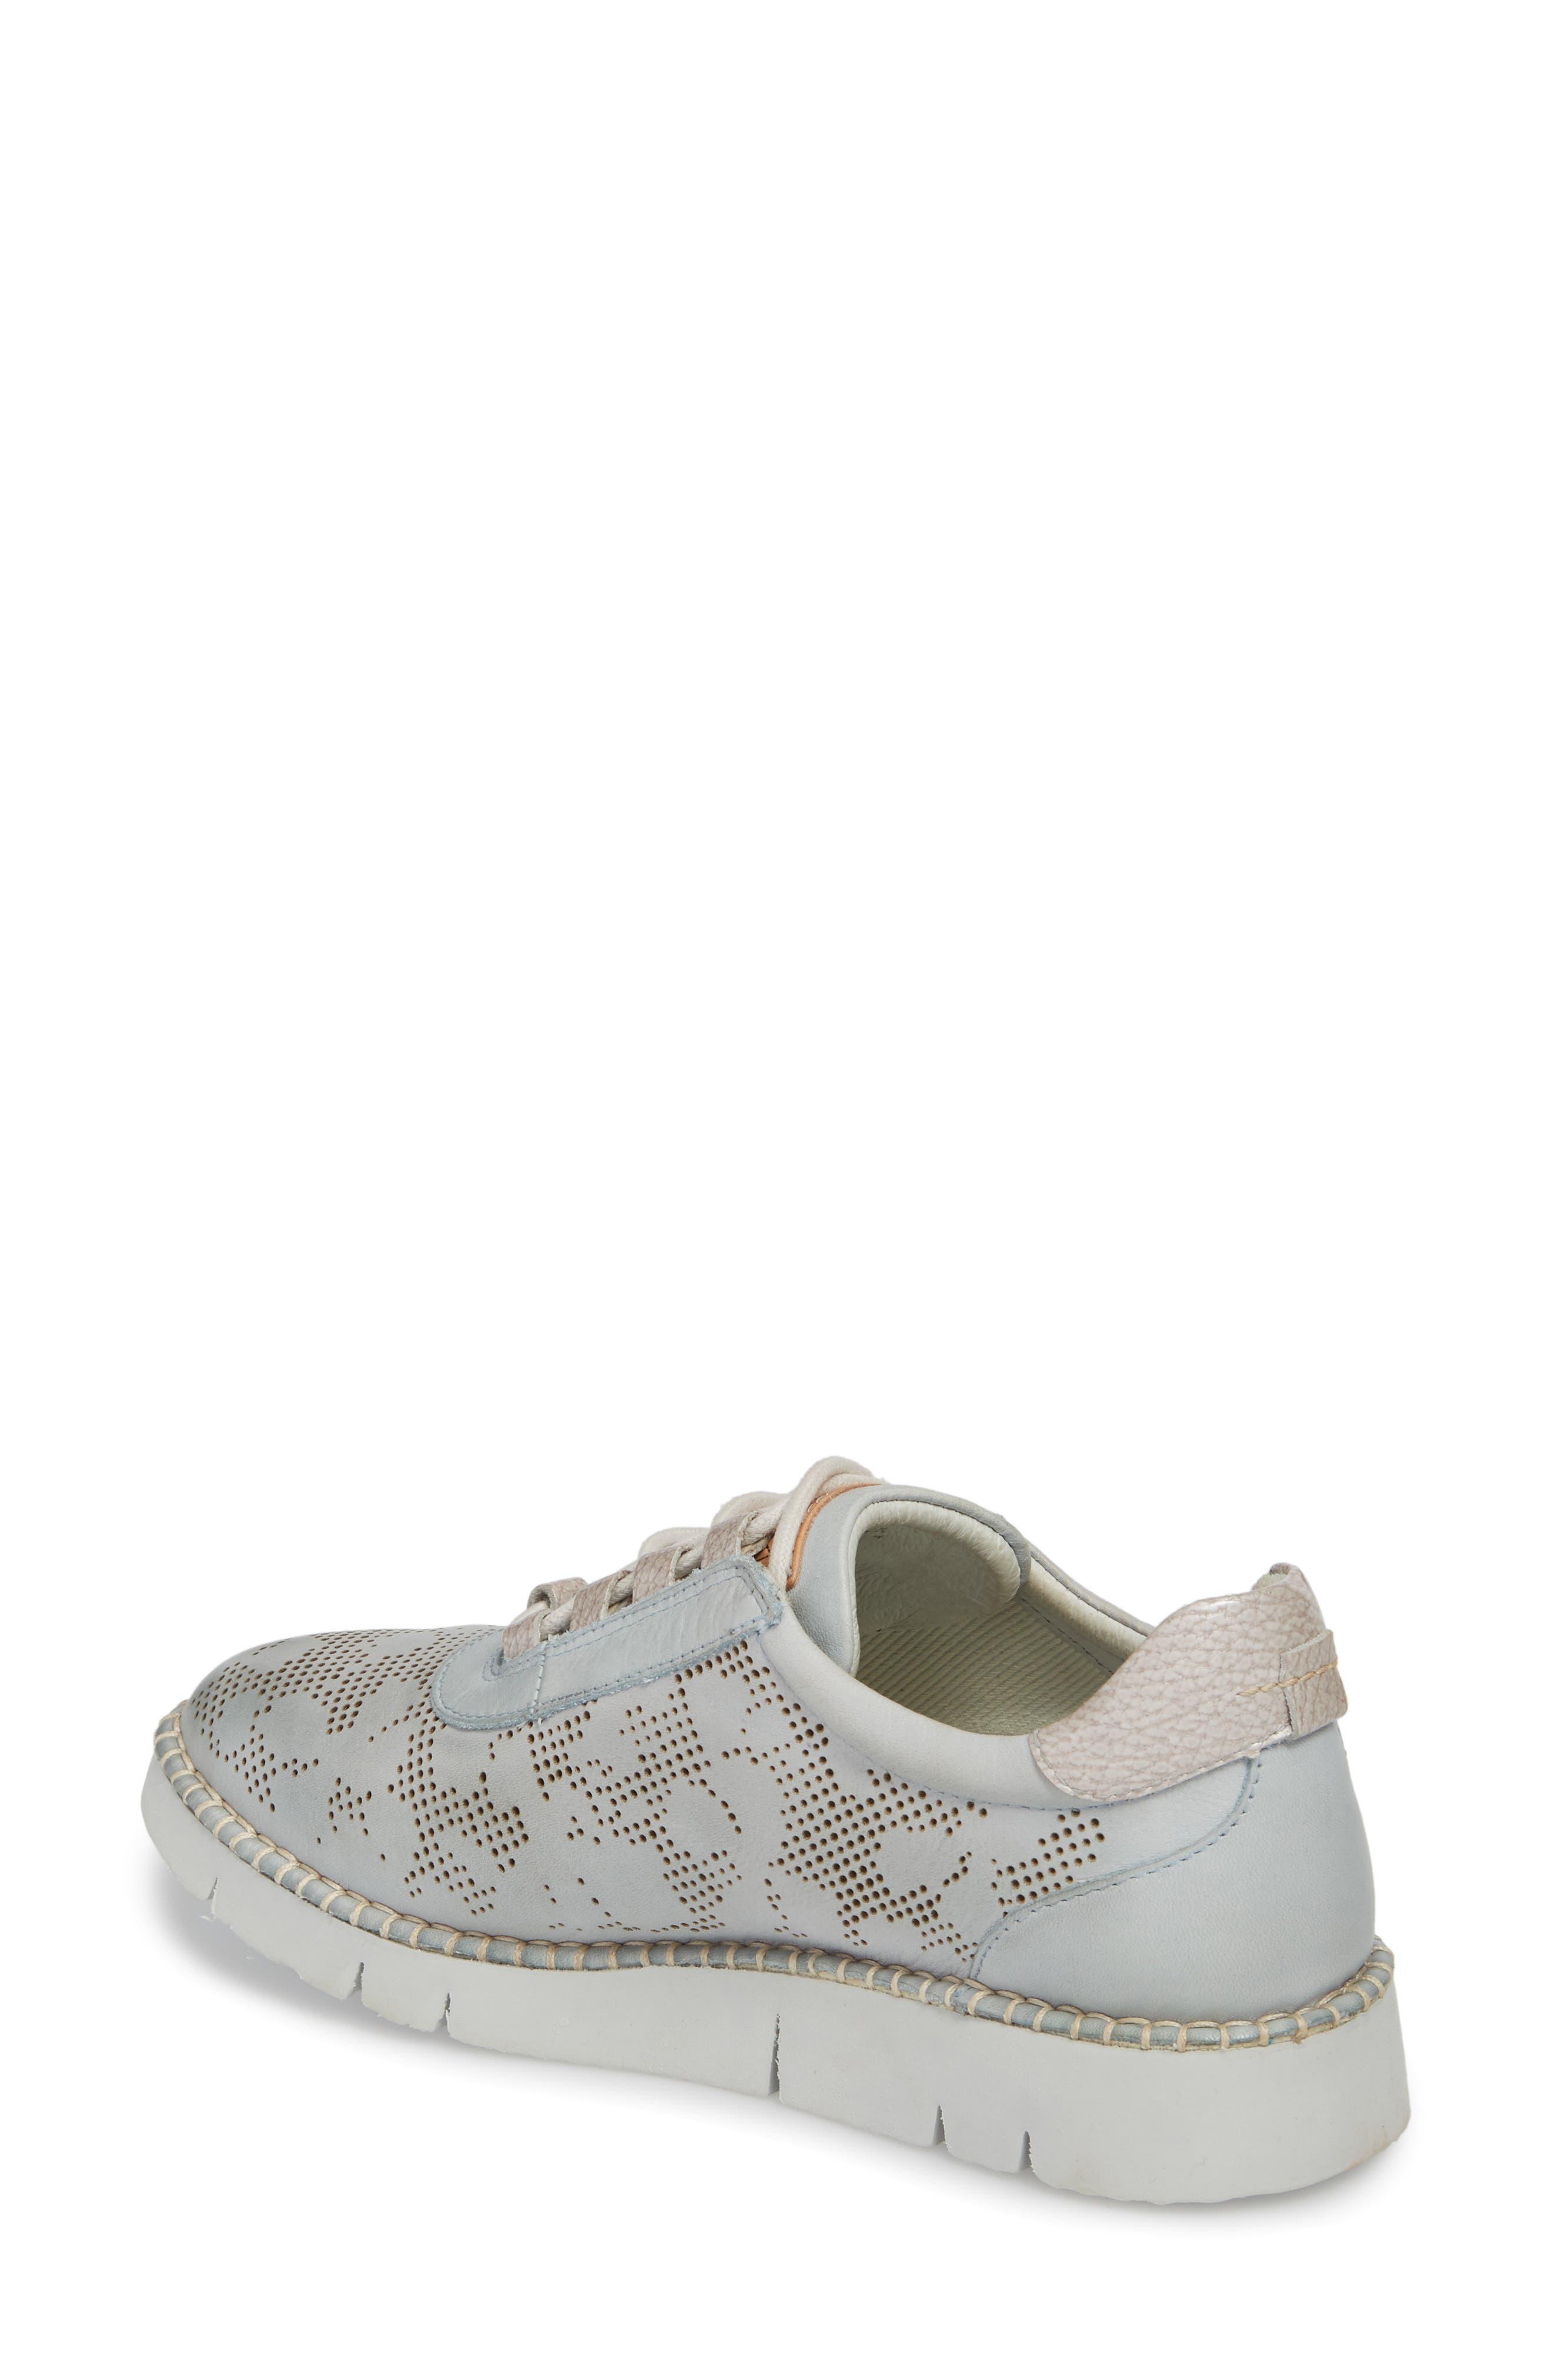 Vera Sneaker,                             Alternate thumbnail 2, color,                             AQUA LEATHER